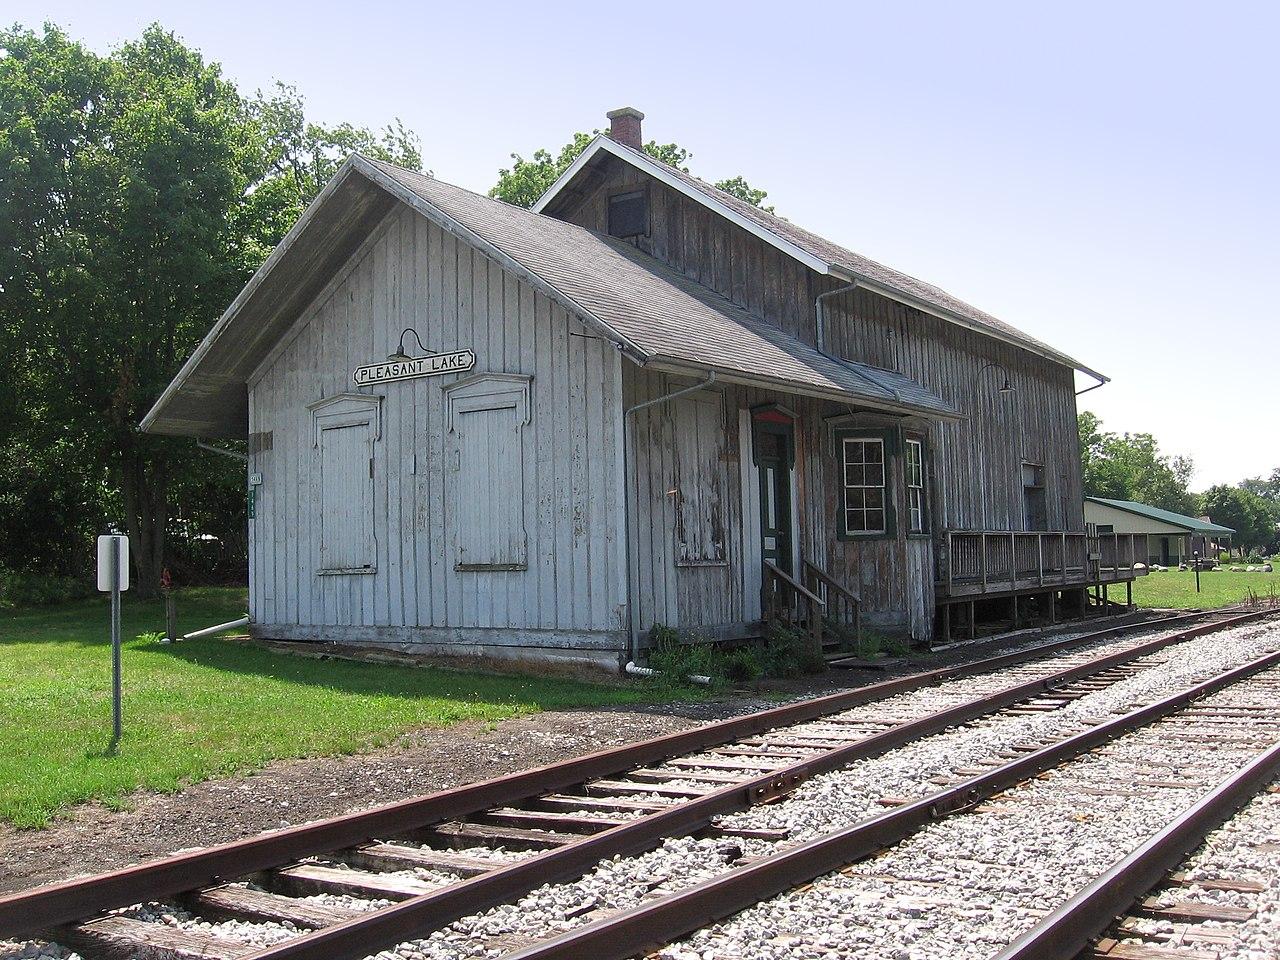 lake station single guys Guys garage address: 2220 ripley street, lake station, in 46405, united states phone: +1 219-963-1404.